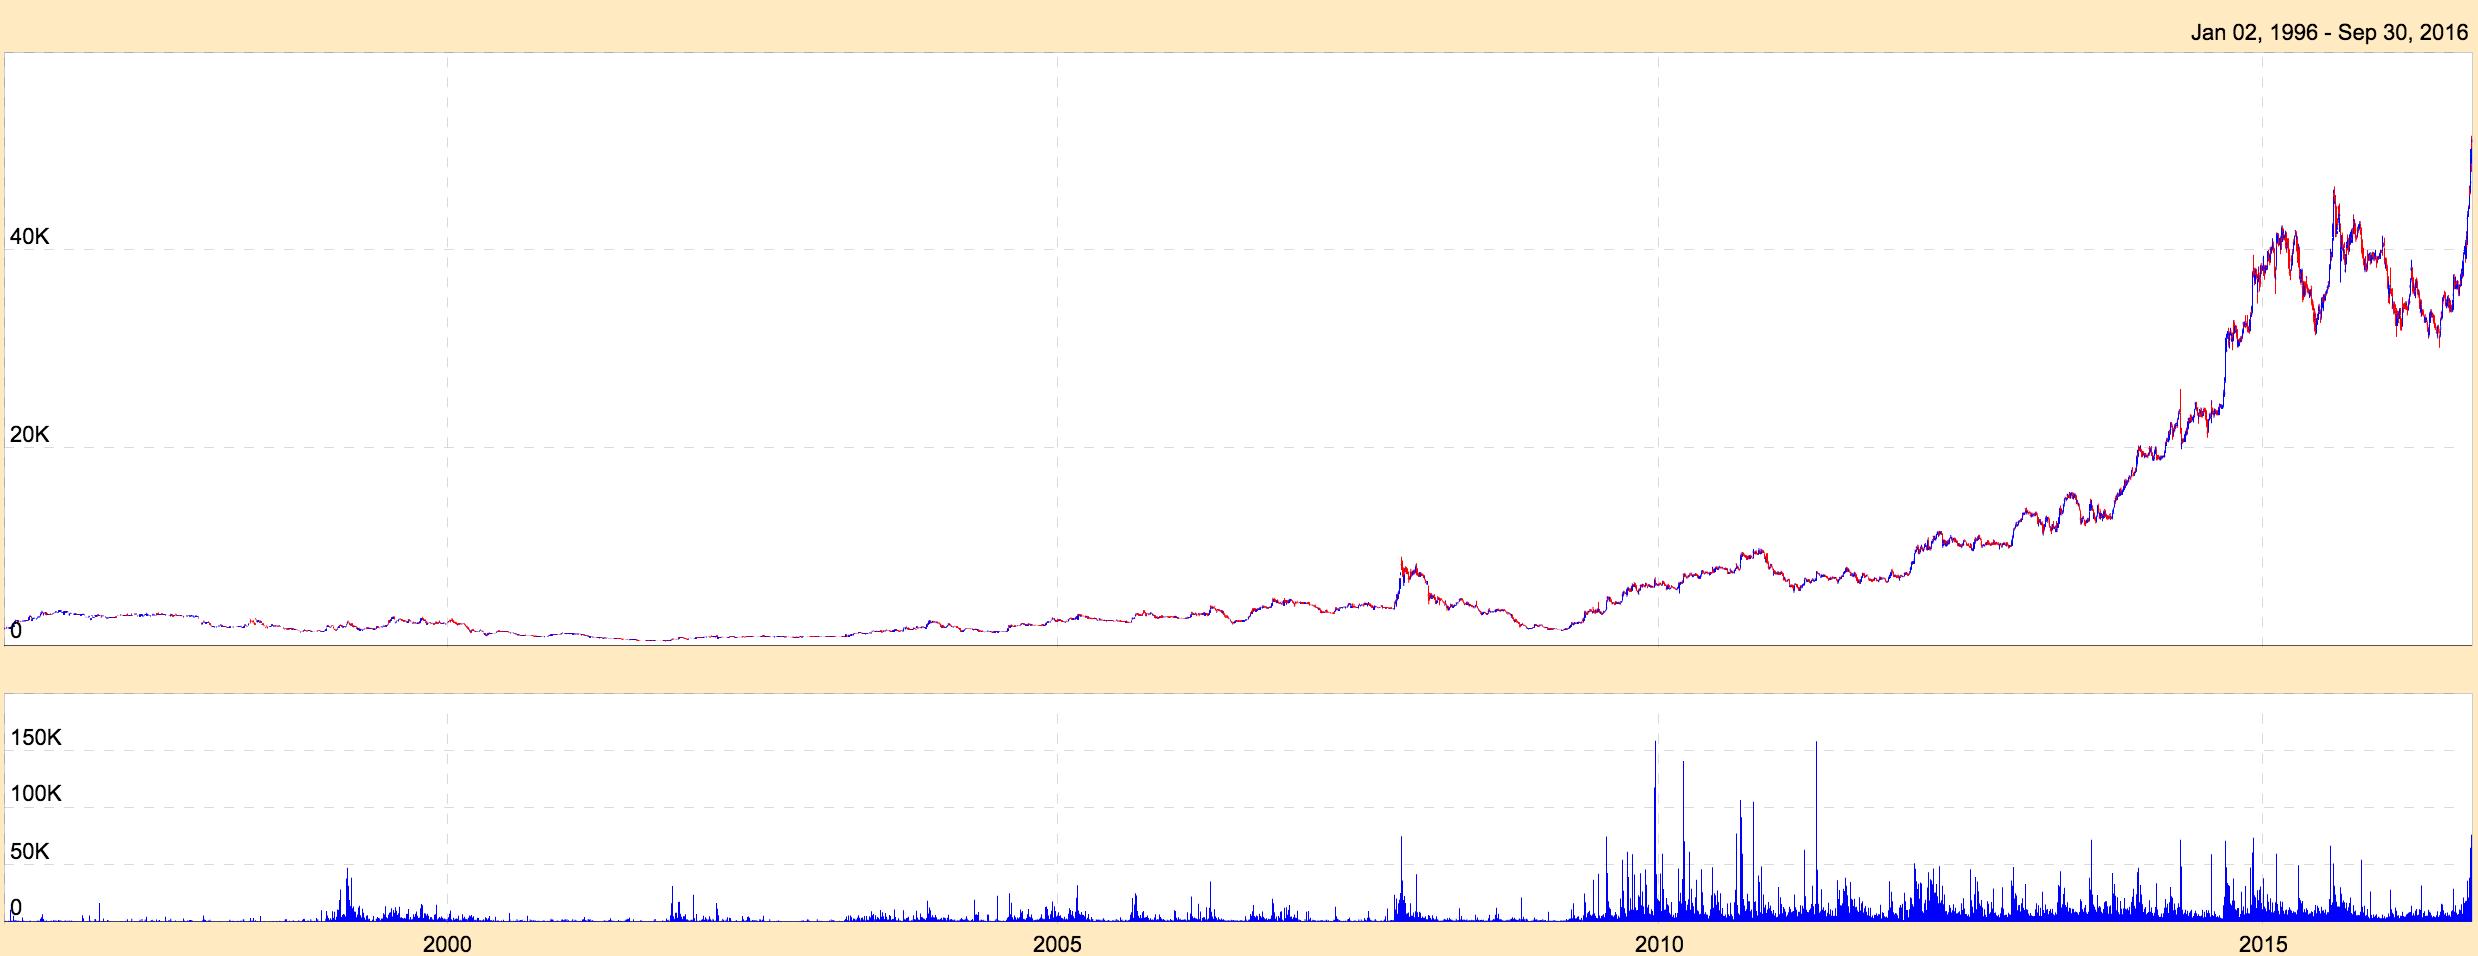 MRF Chart till 2016 - No Stock Splits and preserving shareholder quality